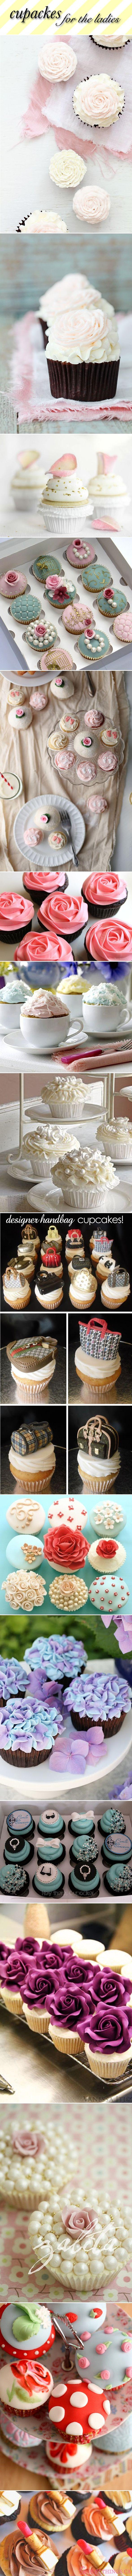 Amazing cupcakes!